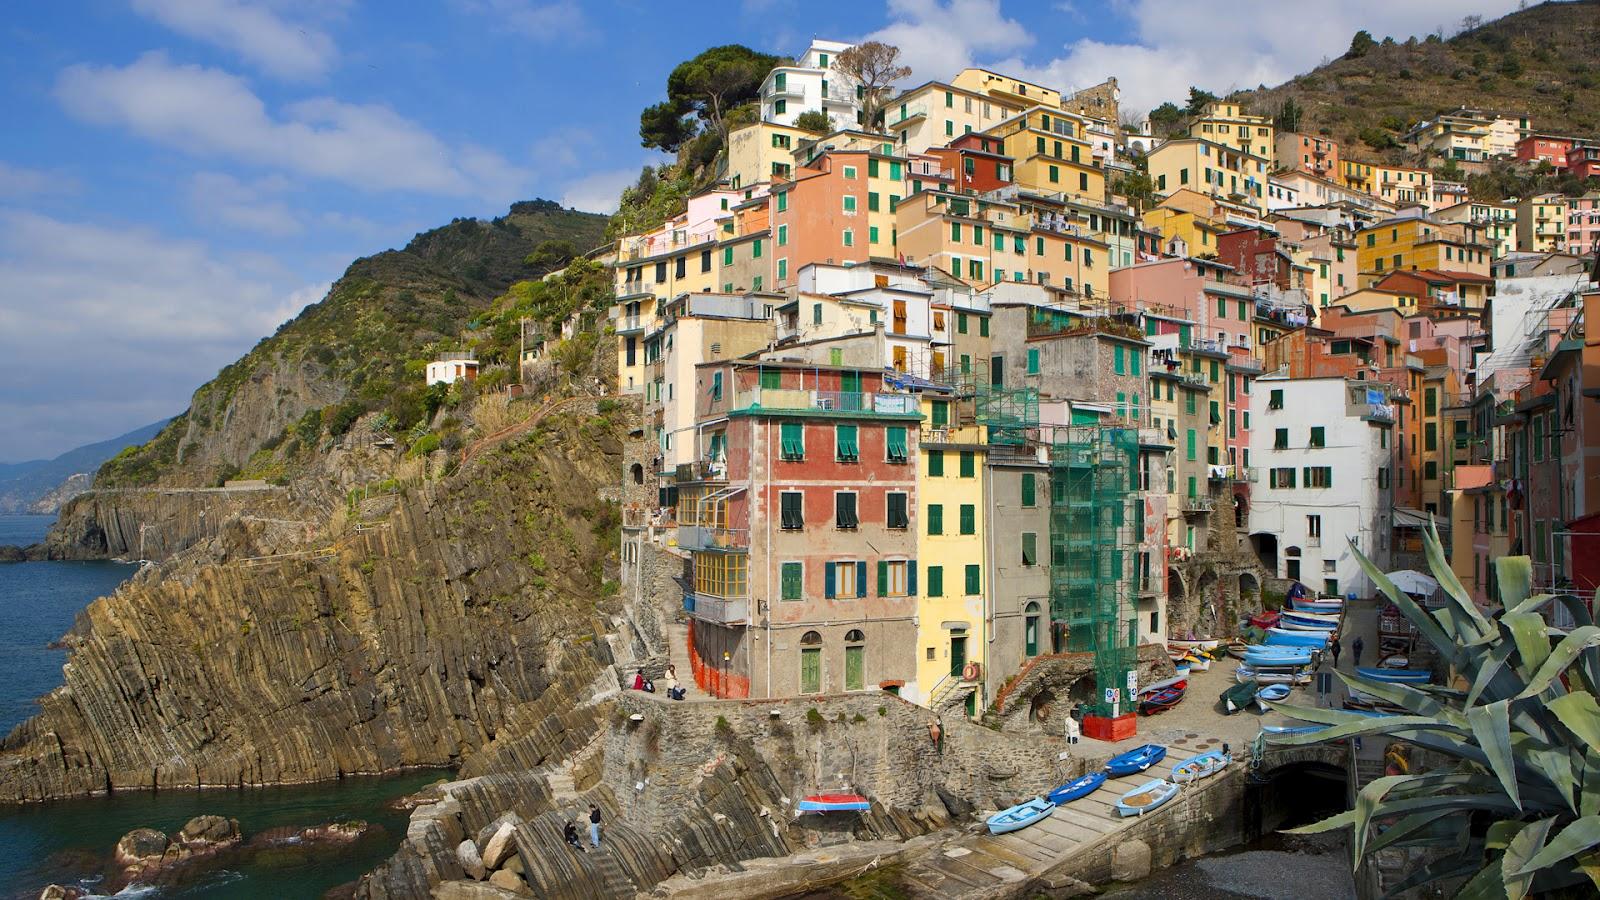 http://2.bp.blogspot.com/-KCB52P1t63k/UA1Z7RSAt4I/AAAAAAAAAWc/09oqO9ZTU-Q/s1600/Houses+in+Riomaggiore,+La+Spezia,+Cinque+Terre,+Italy.jpg